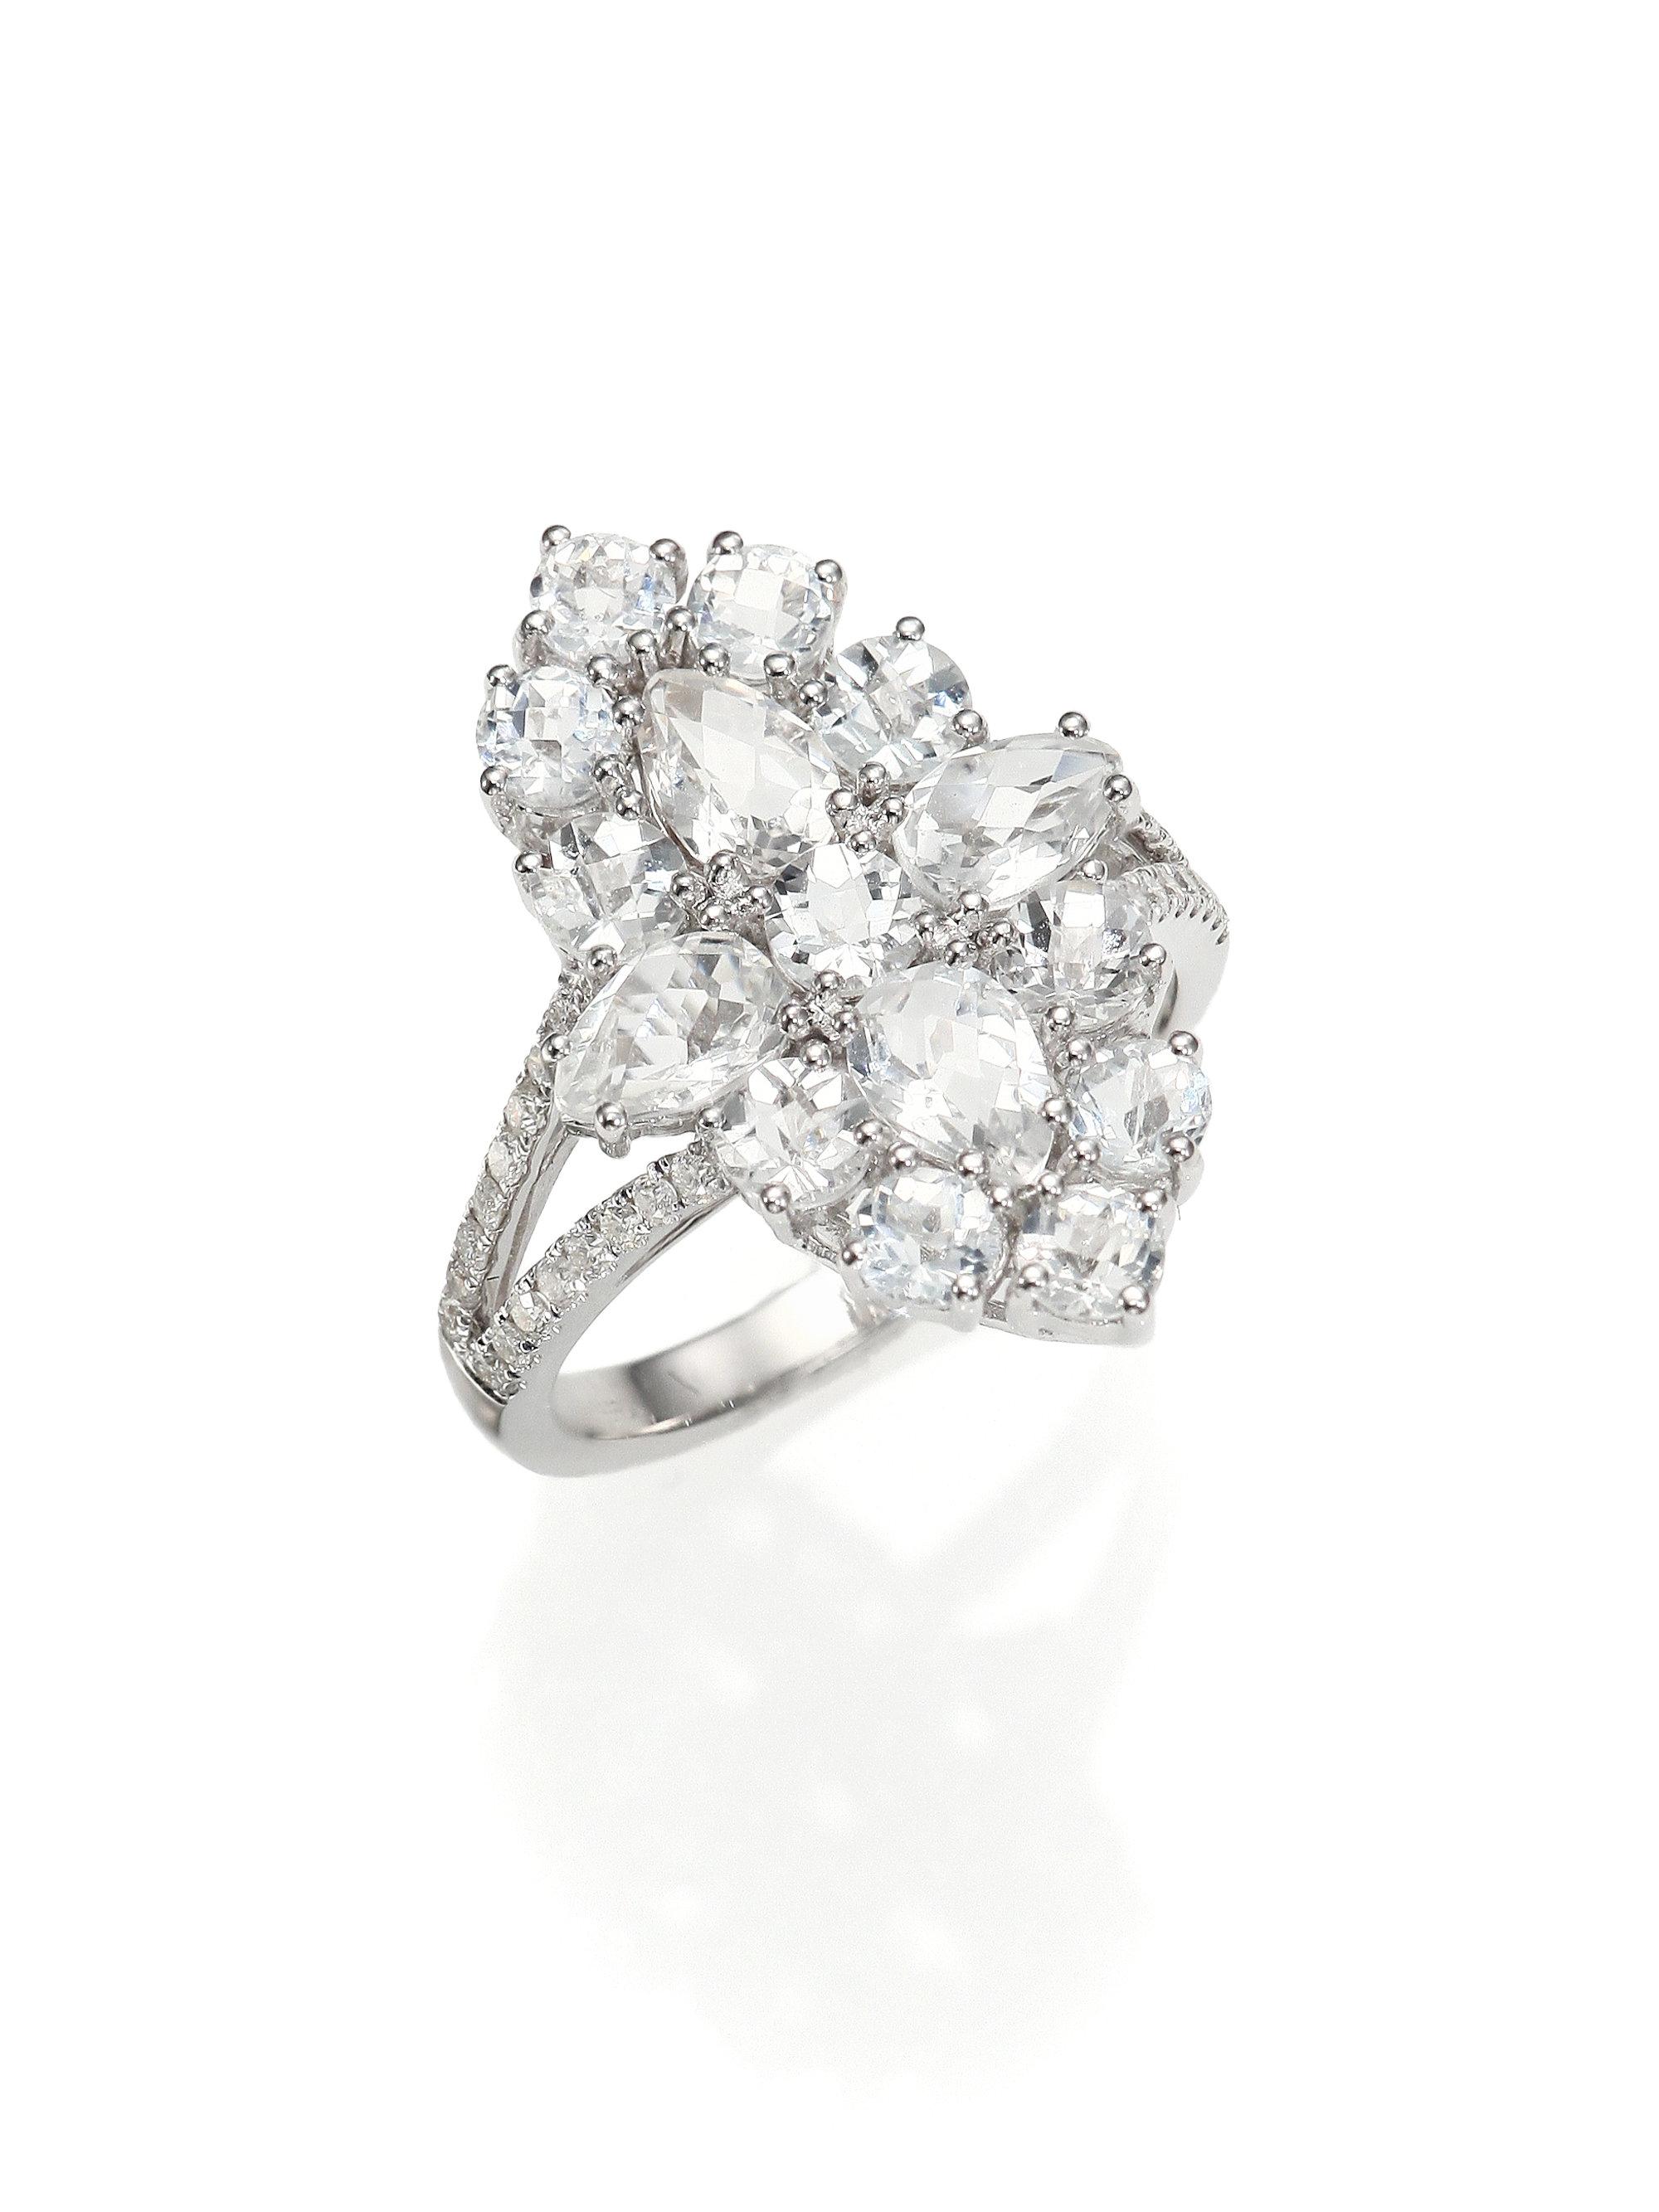 meira t pave white topaz 14k white gold ring in